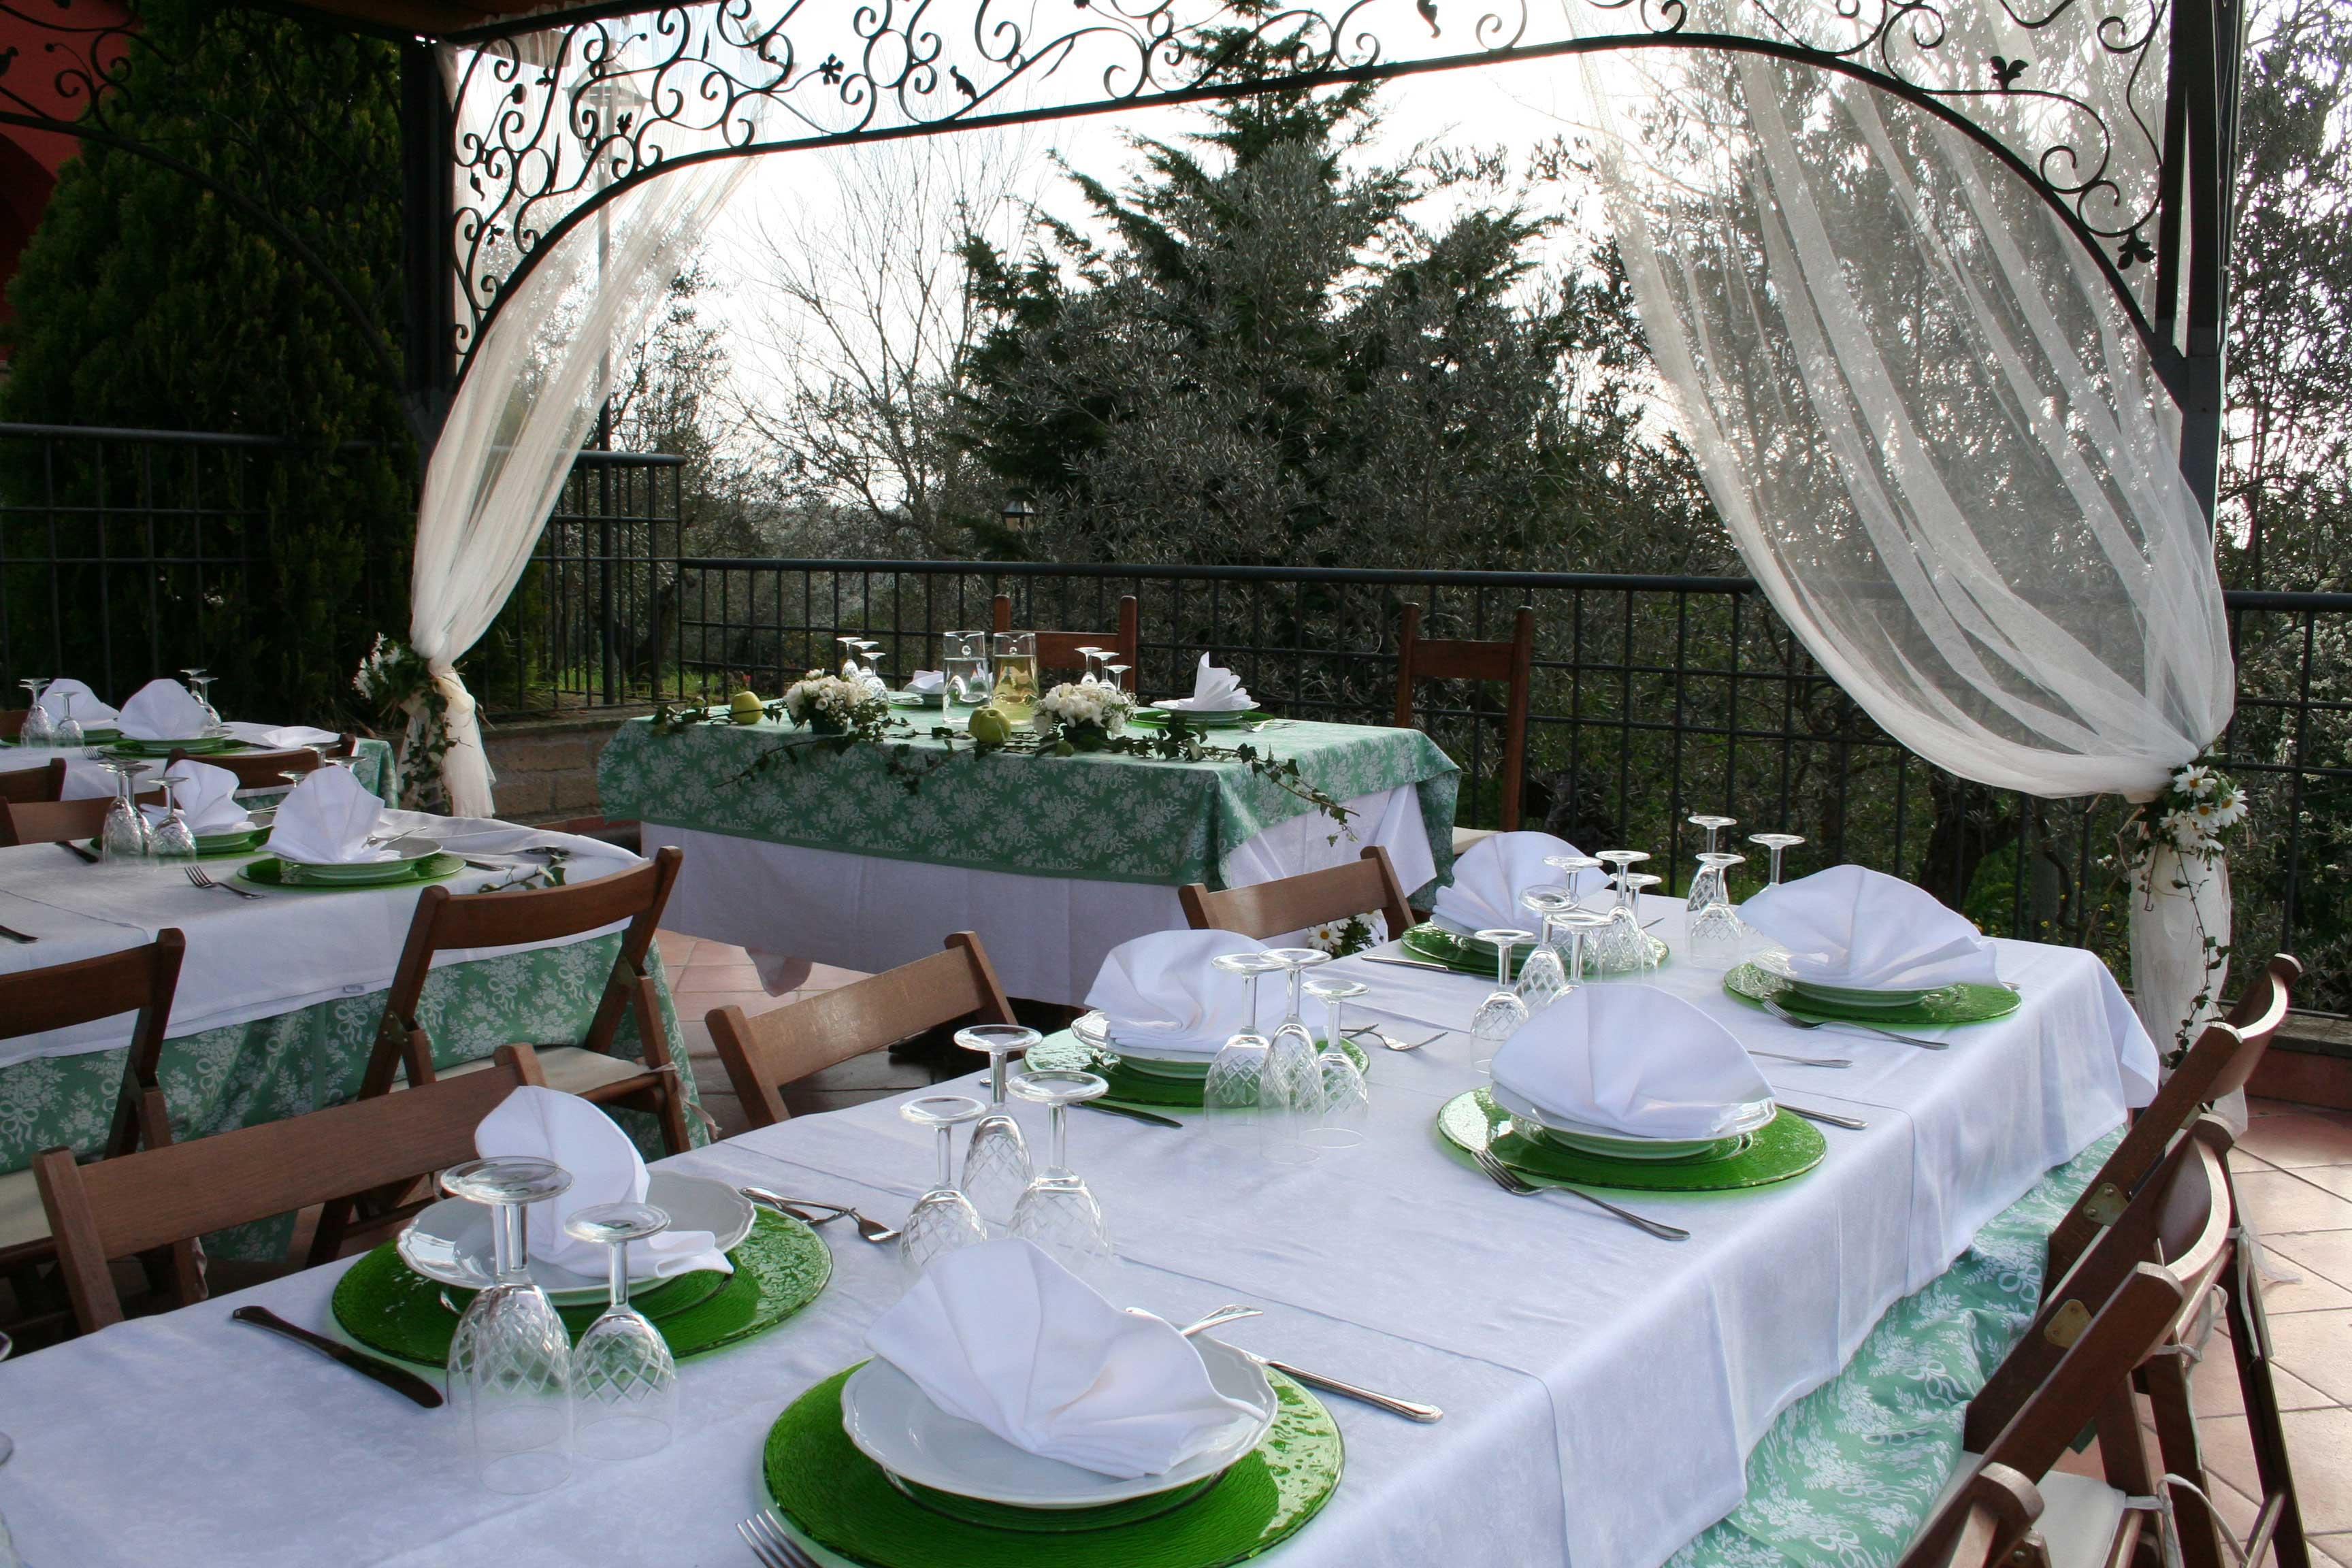 Matrimoni Romani Antichi : Matrimonio in agriturismo vicino roma ricevimenti e feste